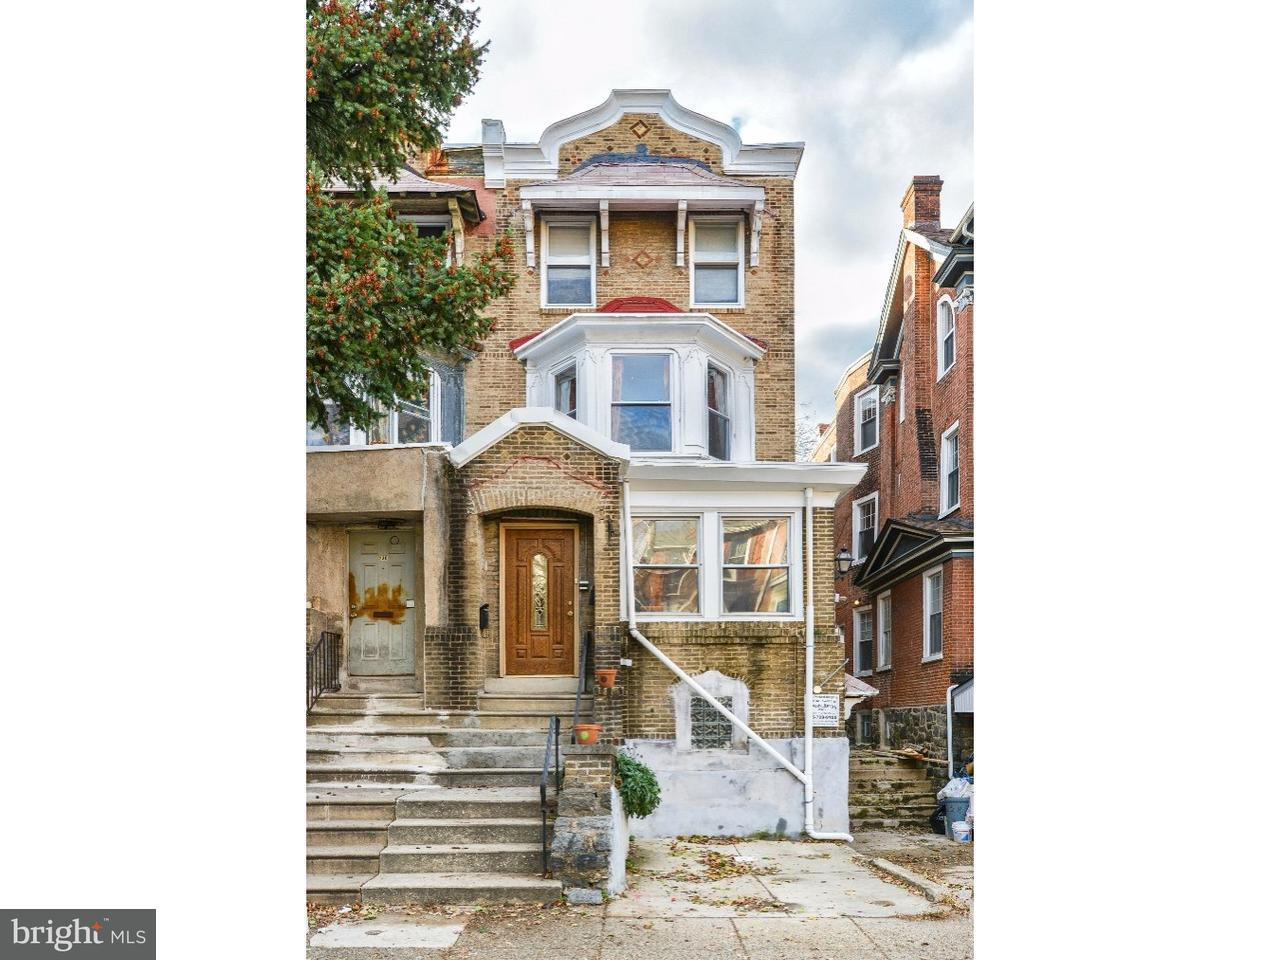 228 S 46TH Philadelphia, PA 19139